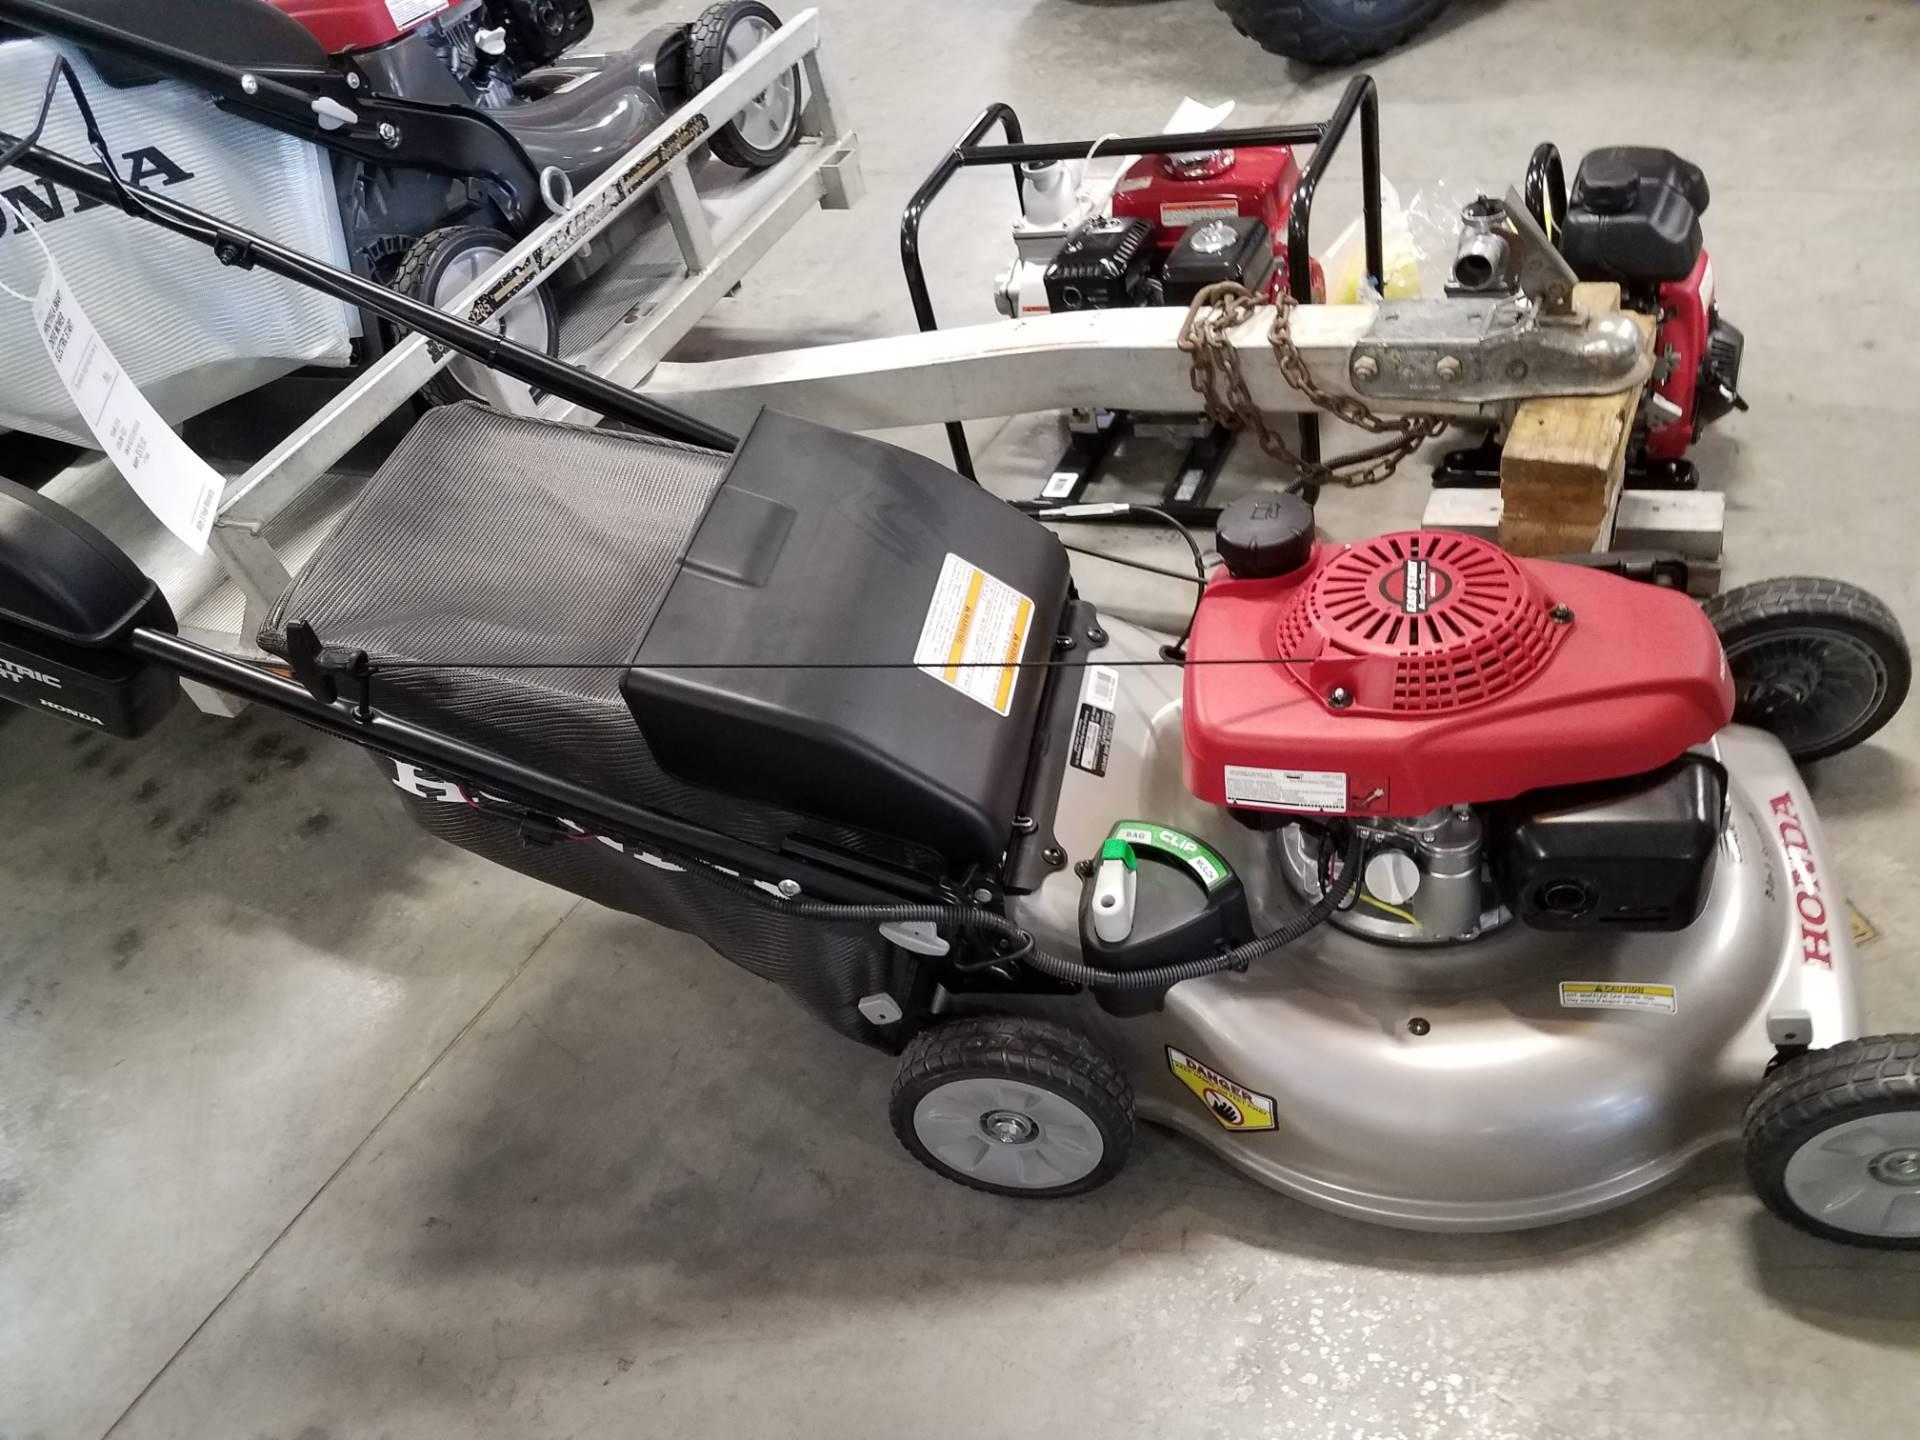 Honda 4514 Belt Diagram Control Wiring Schematic Lawn Mower Drive Quality Organizational